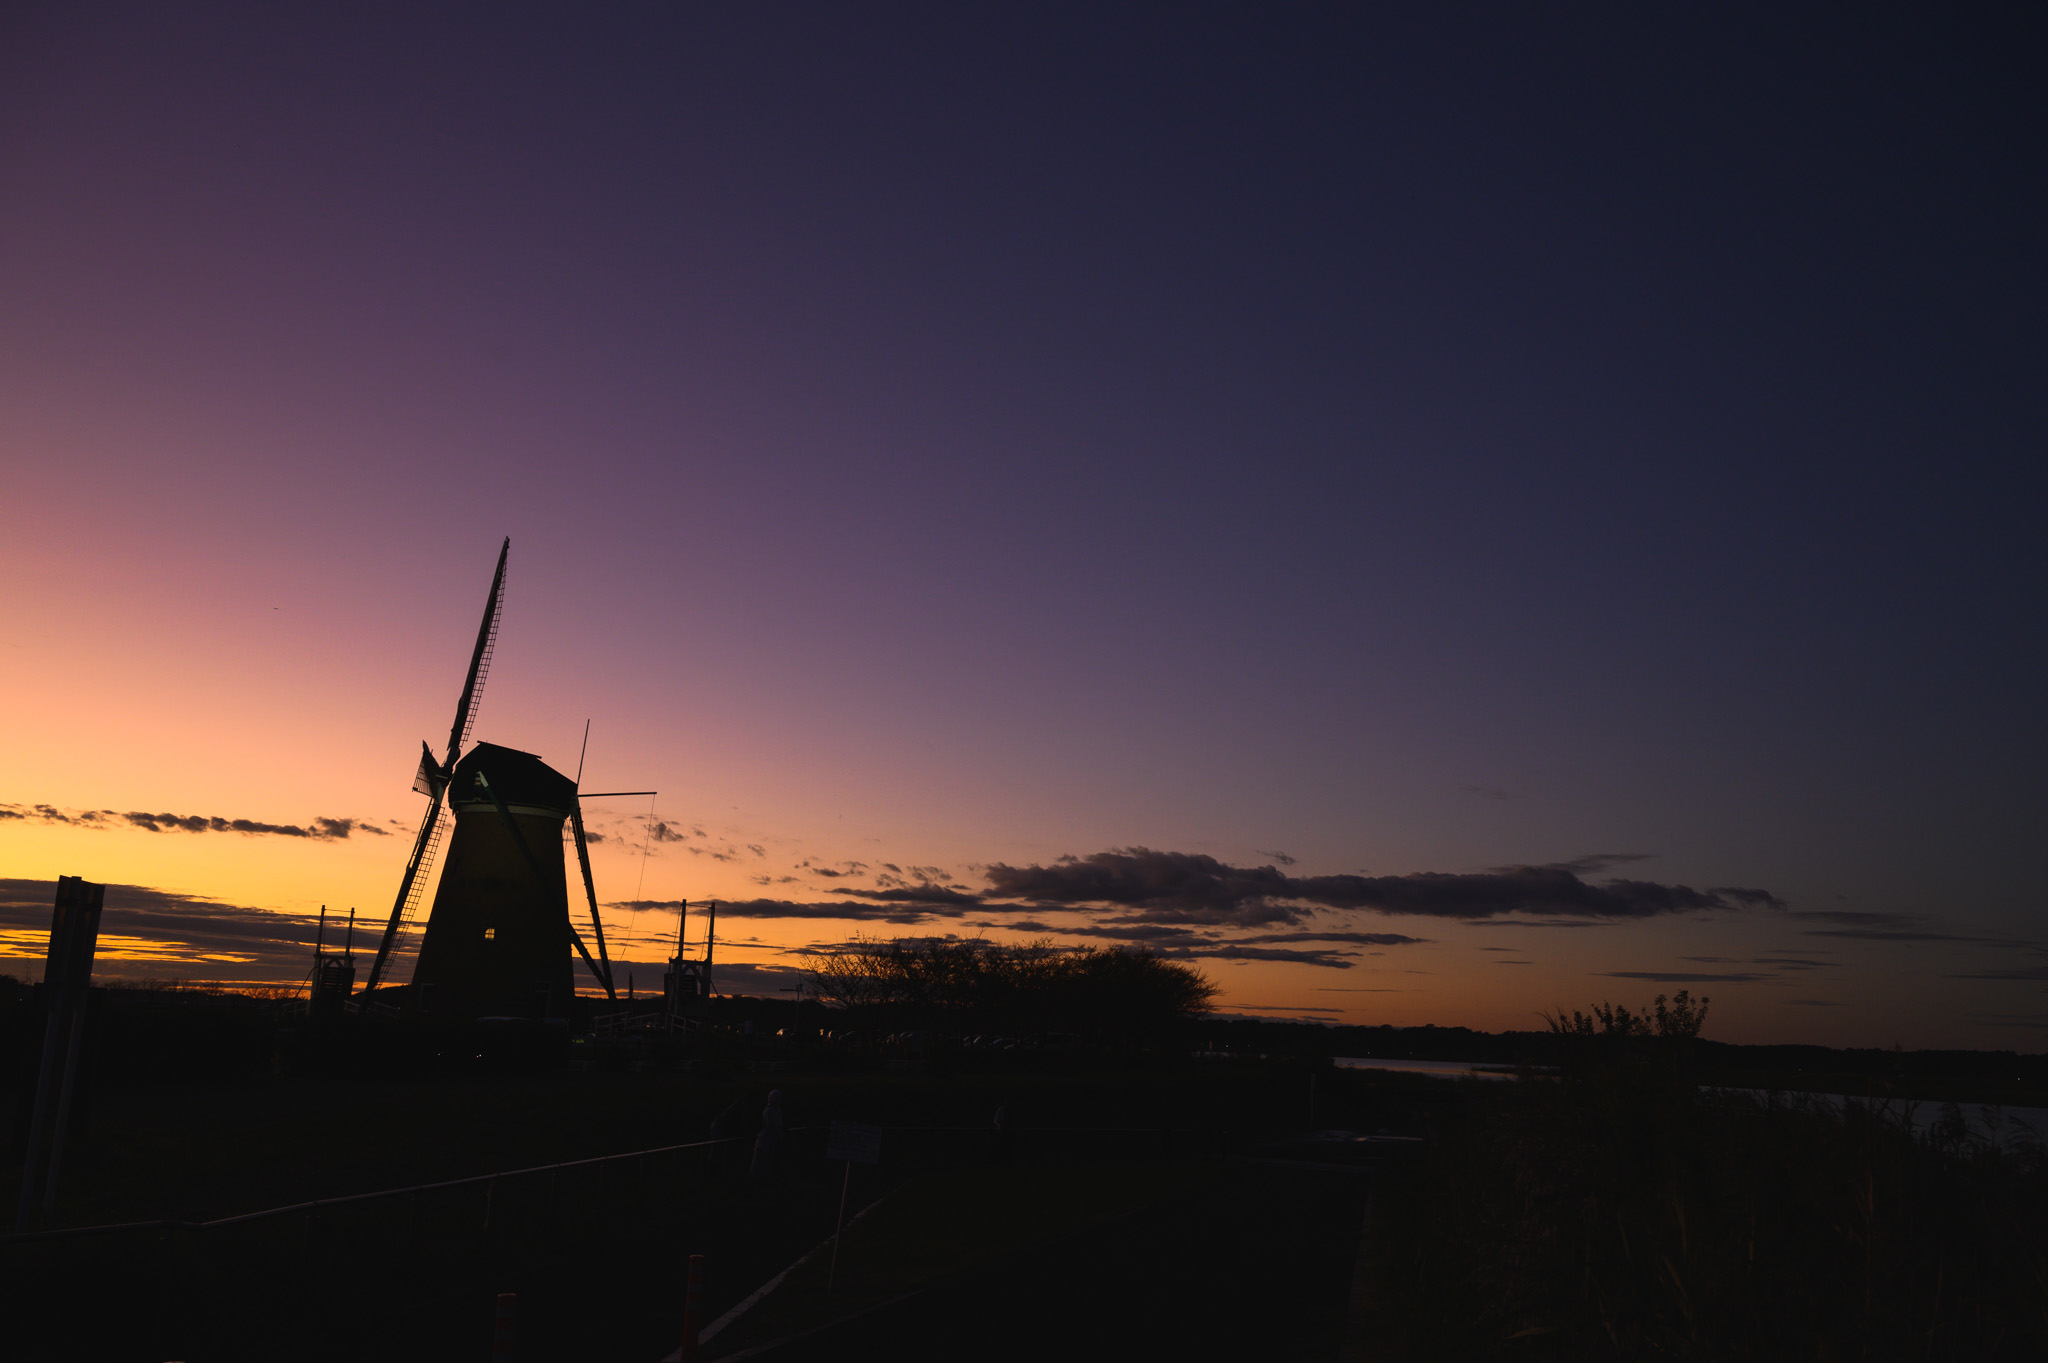 Nikon Z6で撮った佐倉の夕陽